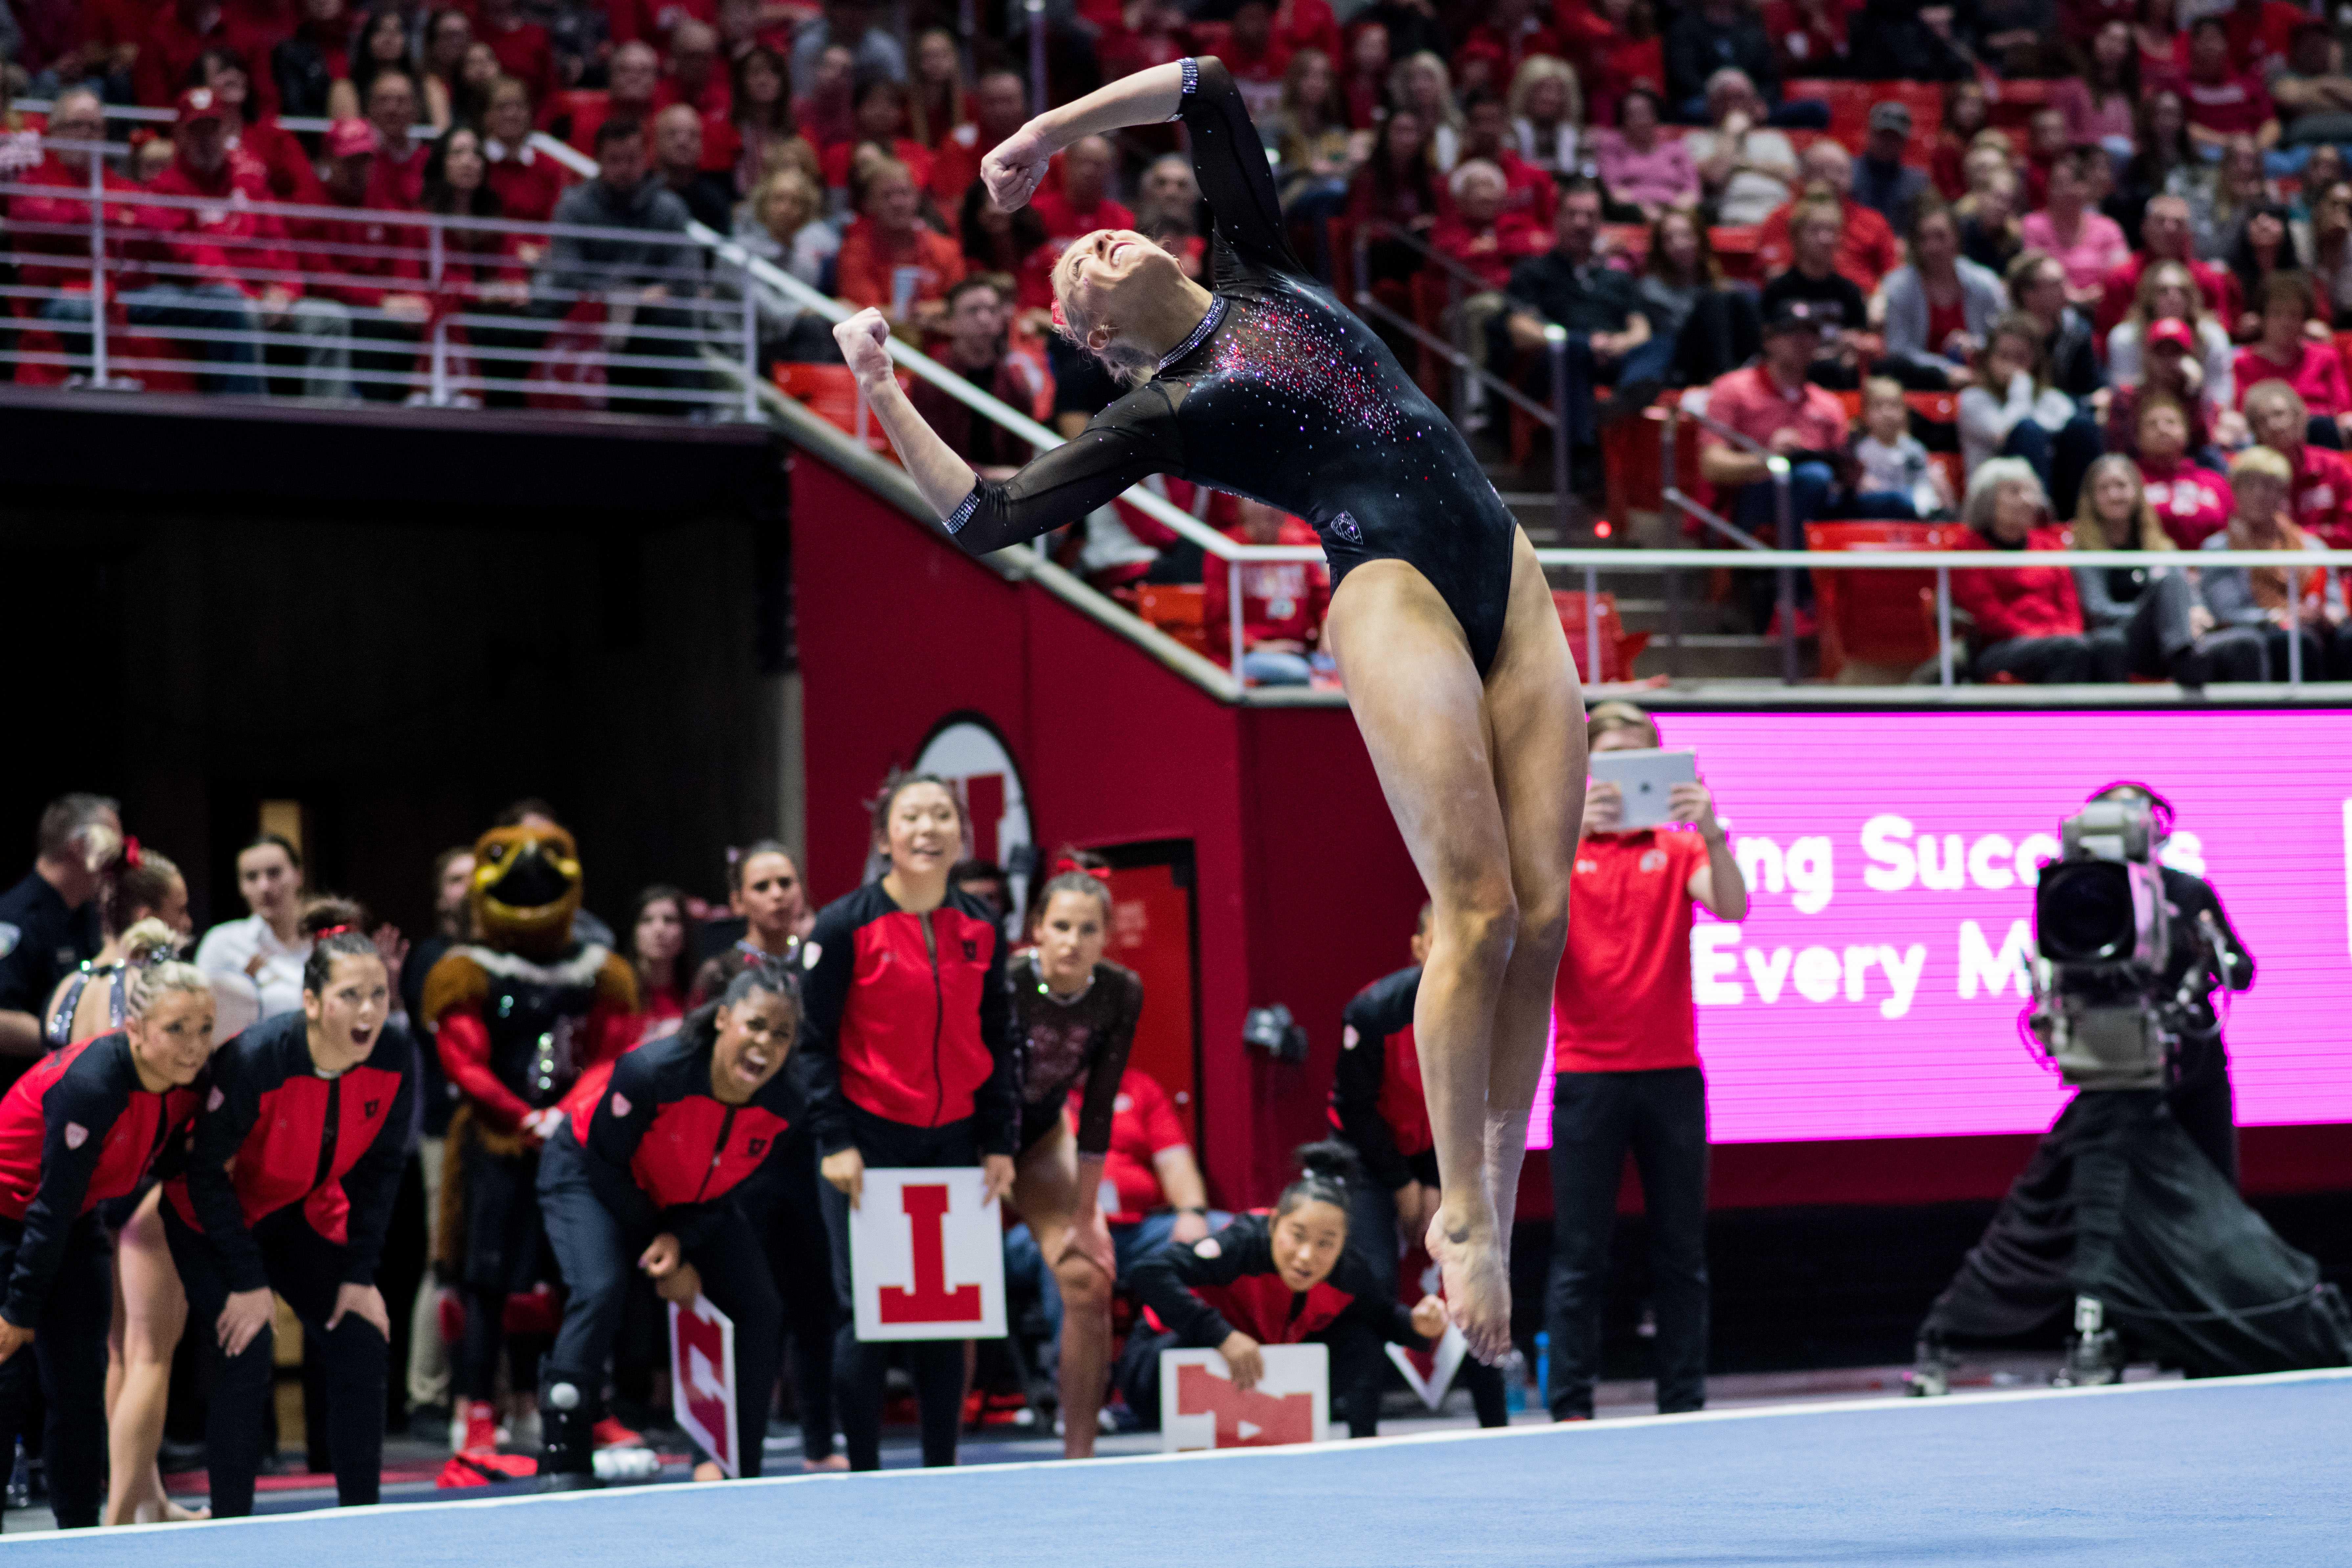 University of Utah senior Makenna Merrell-Giles performed her floor routine in an NCAA Women's Gymnastics meet vs. UCLA at Jon M. Huntsman Center in Salt Lake City, UT on Saturday February 23, 2019.  (Photo by Curtis Lin | Daily Utah Chronicle)